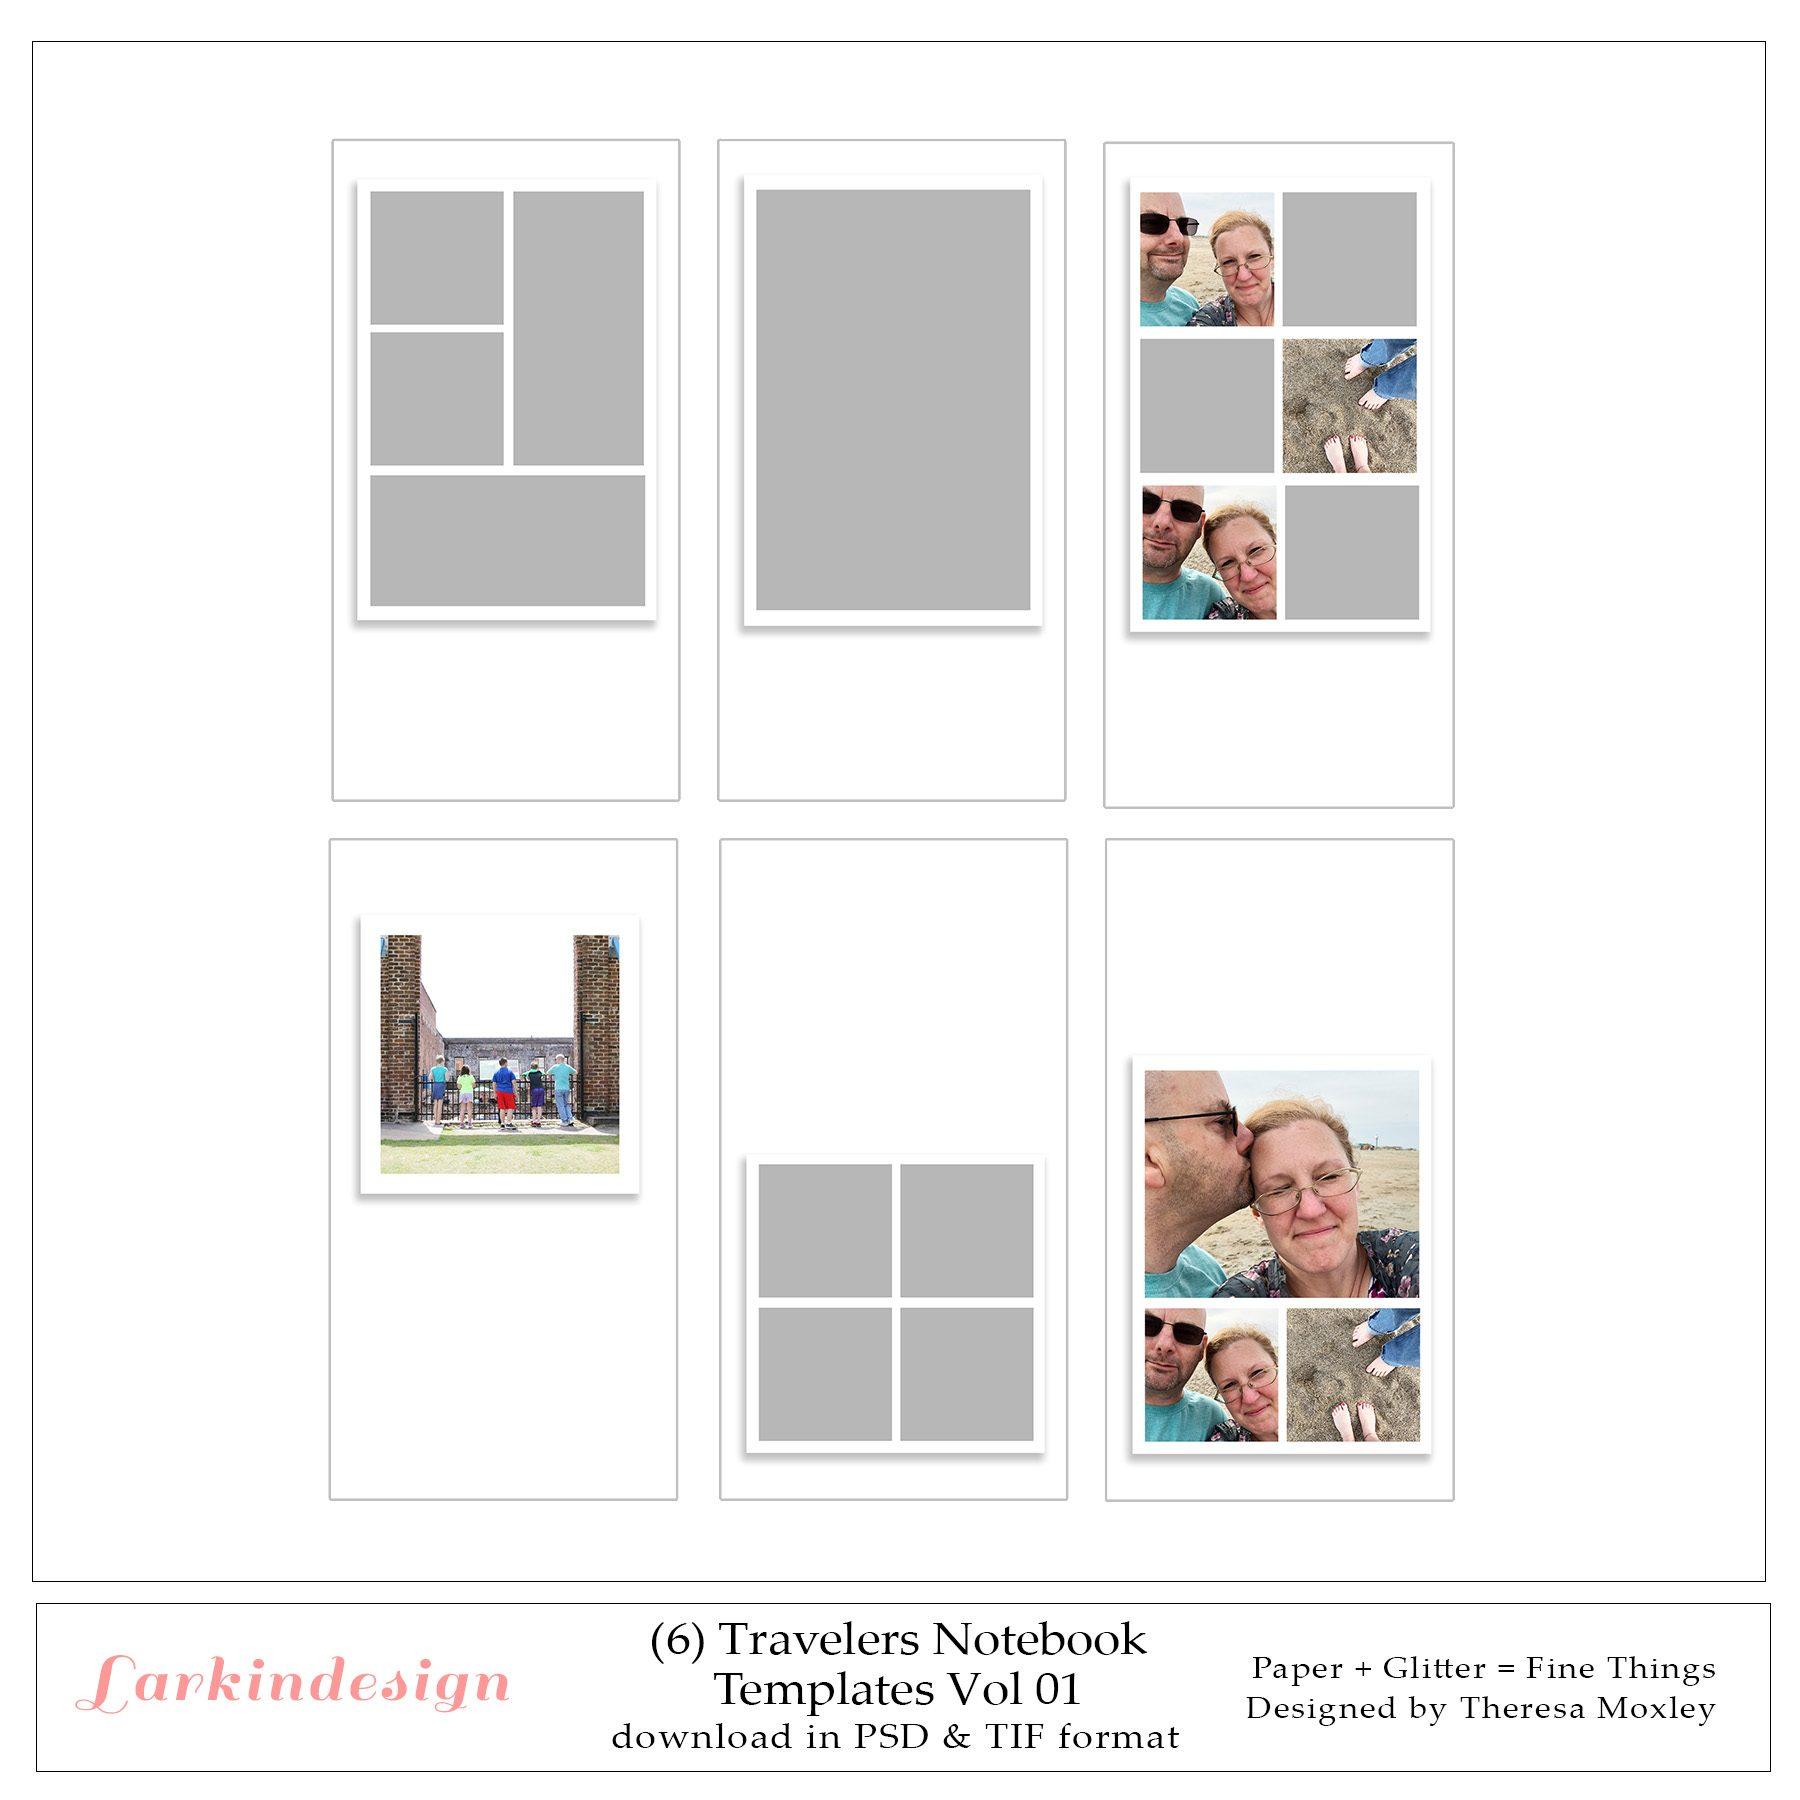 Larkindesign Traveler's Notebook Photo Templates Volume 01